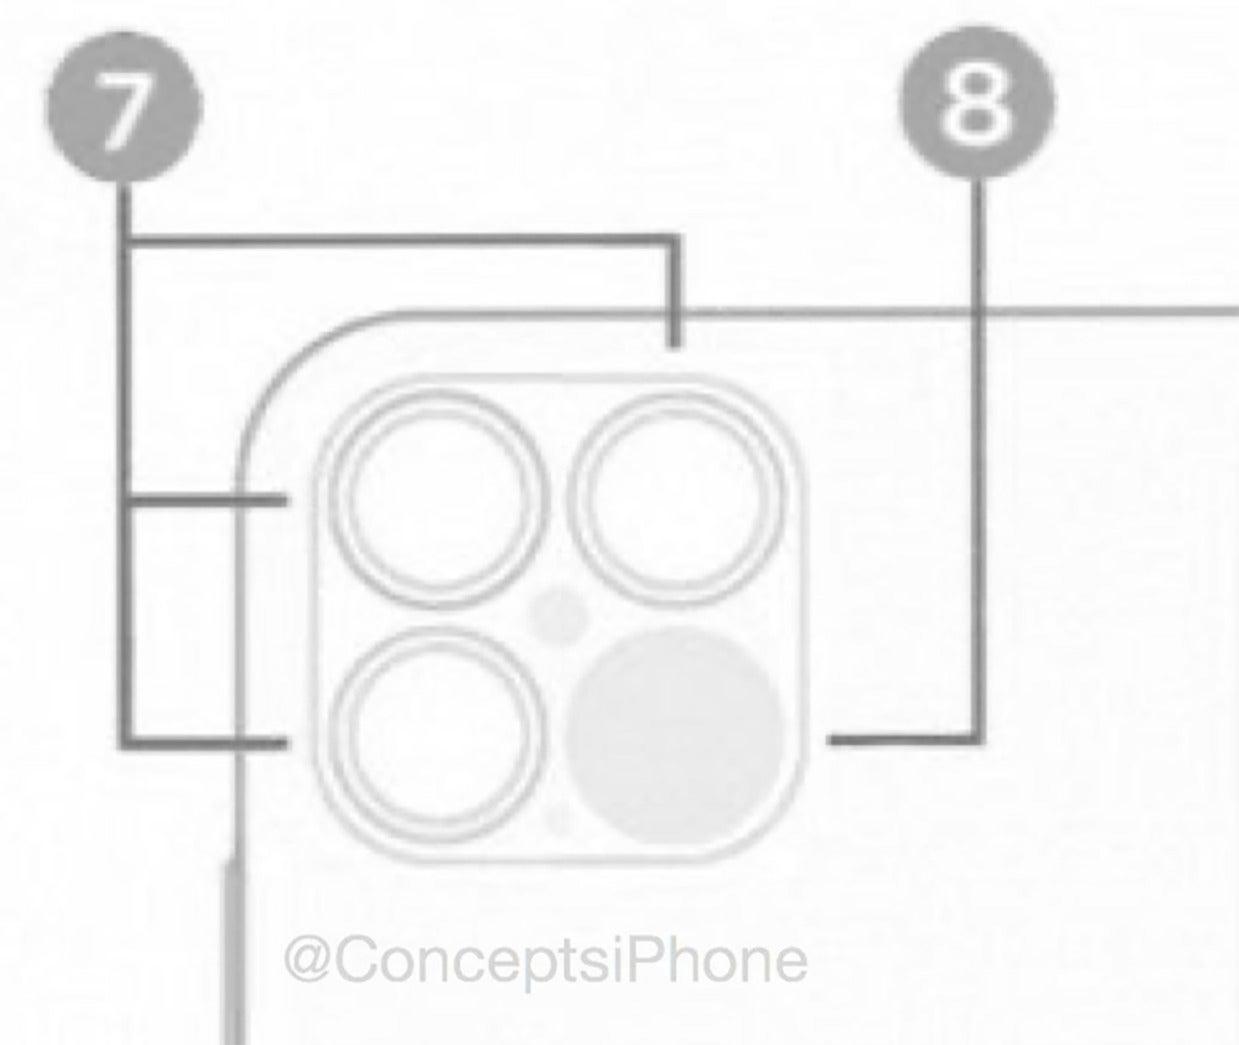 Iphone 12 Rumors 5g Oled Camera Processor And More